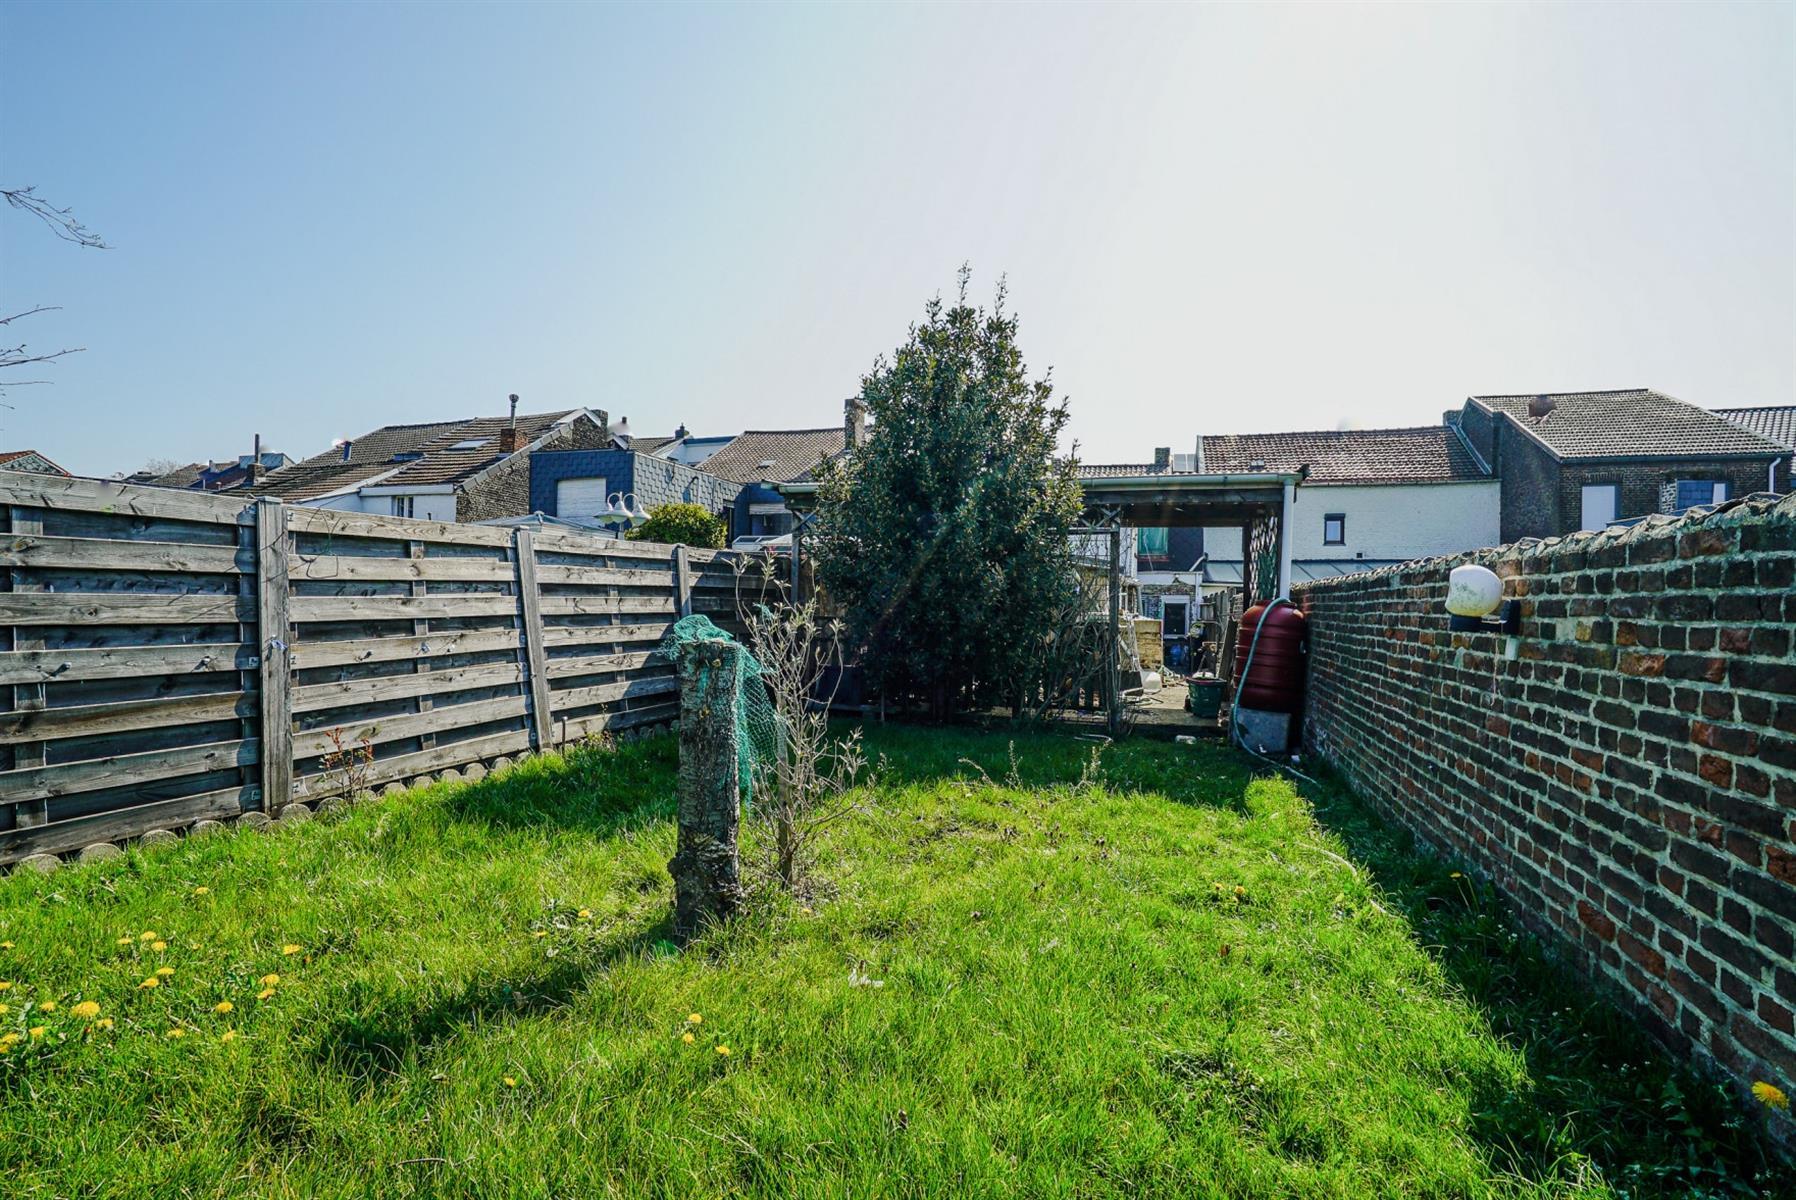 Maison - Oupeye Hermallesous-Argenteau - #4324098-13